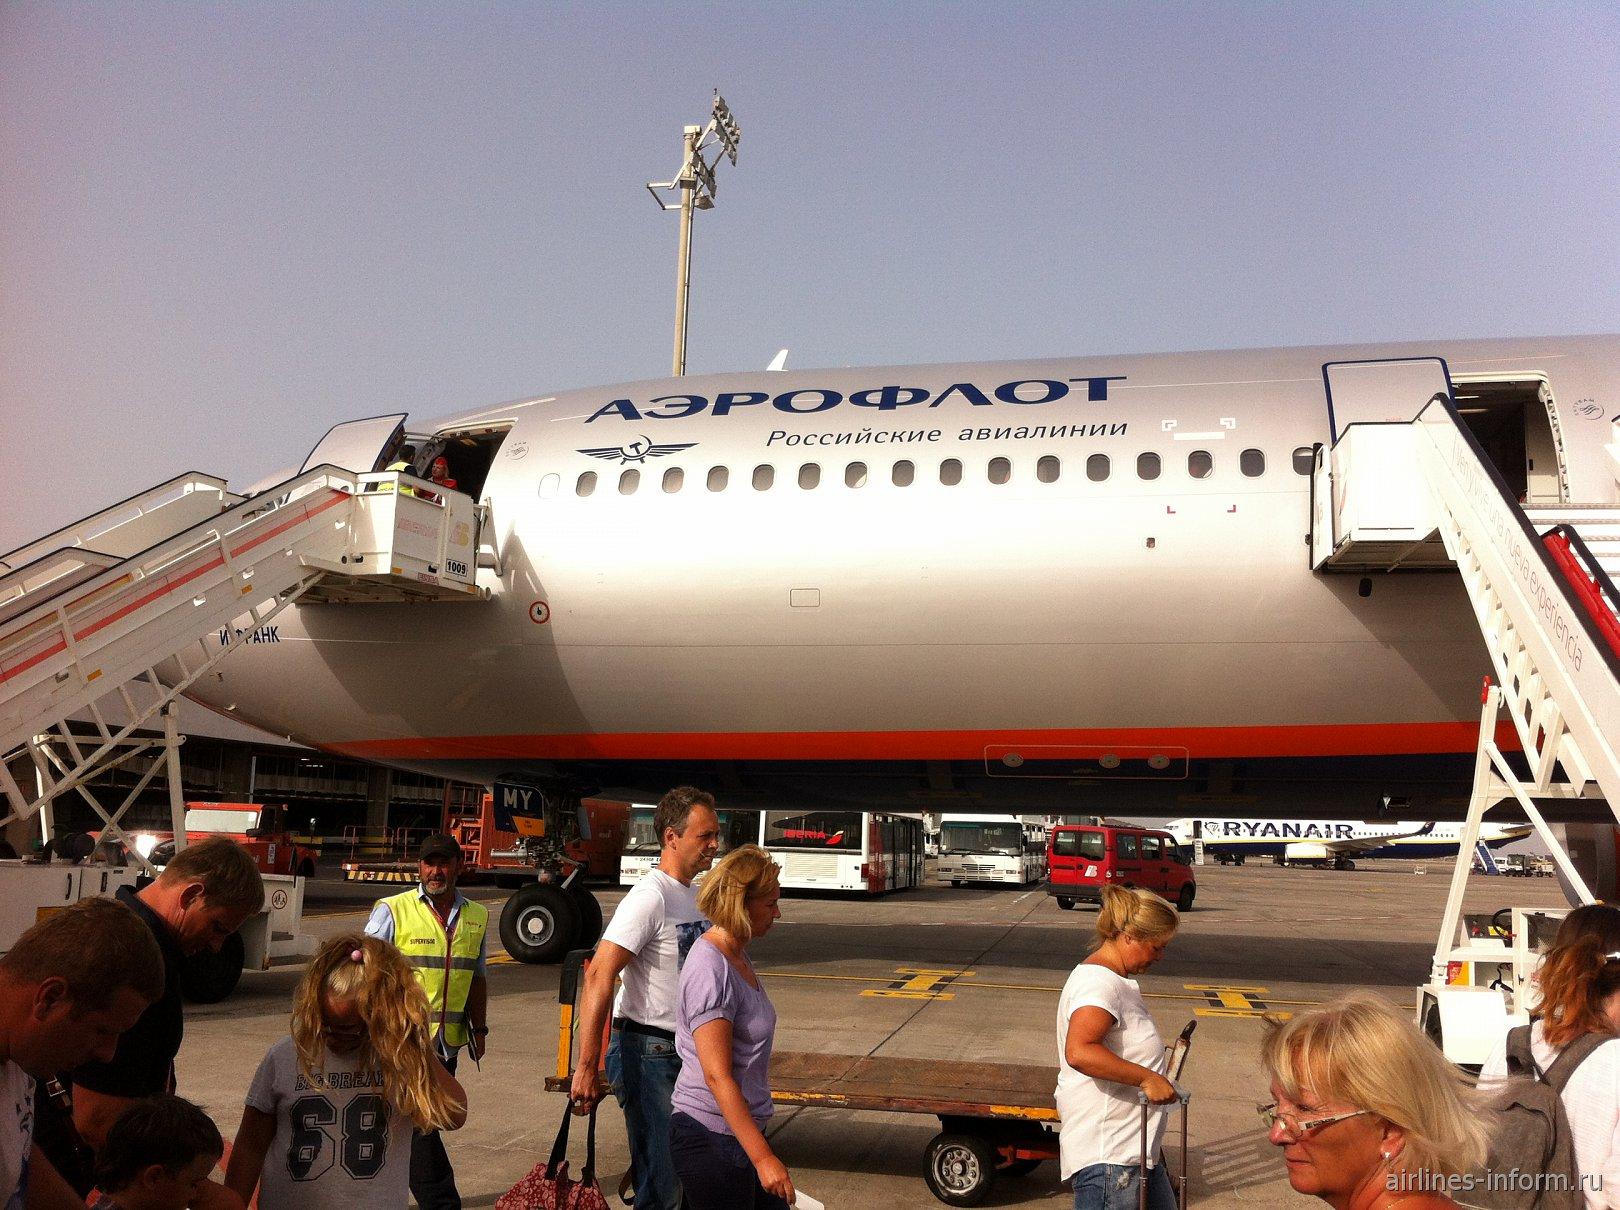 Тенерифе-Москва с Аэрофлотом